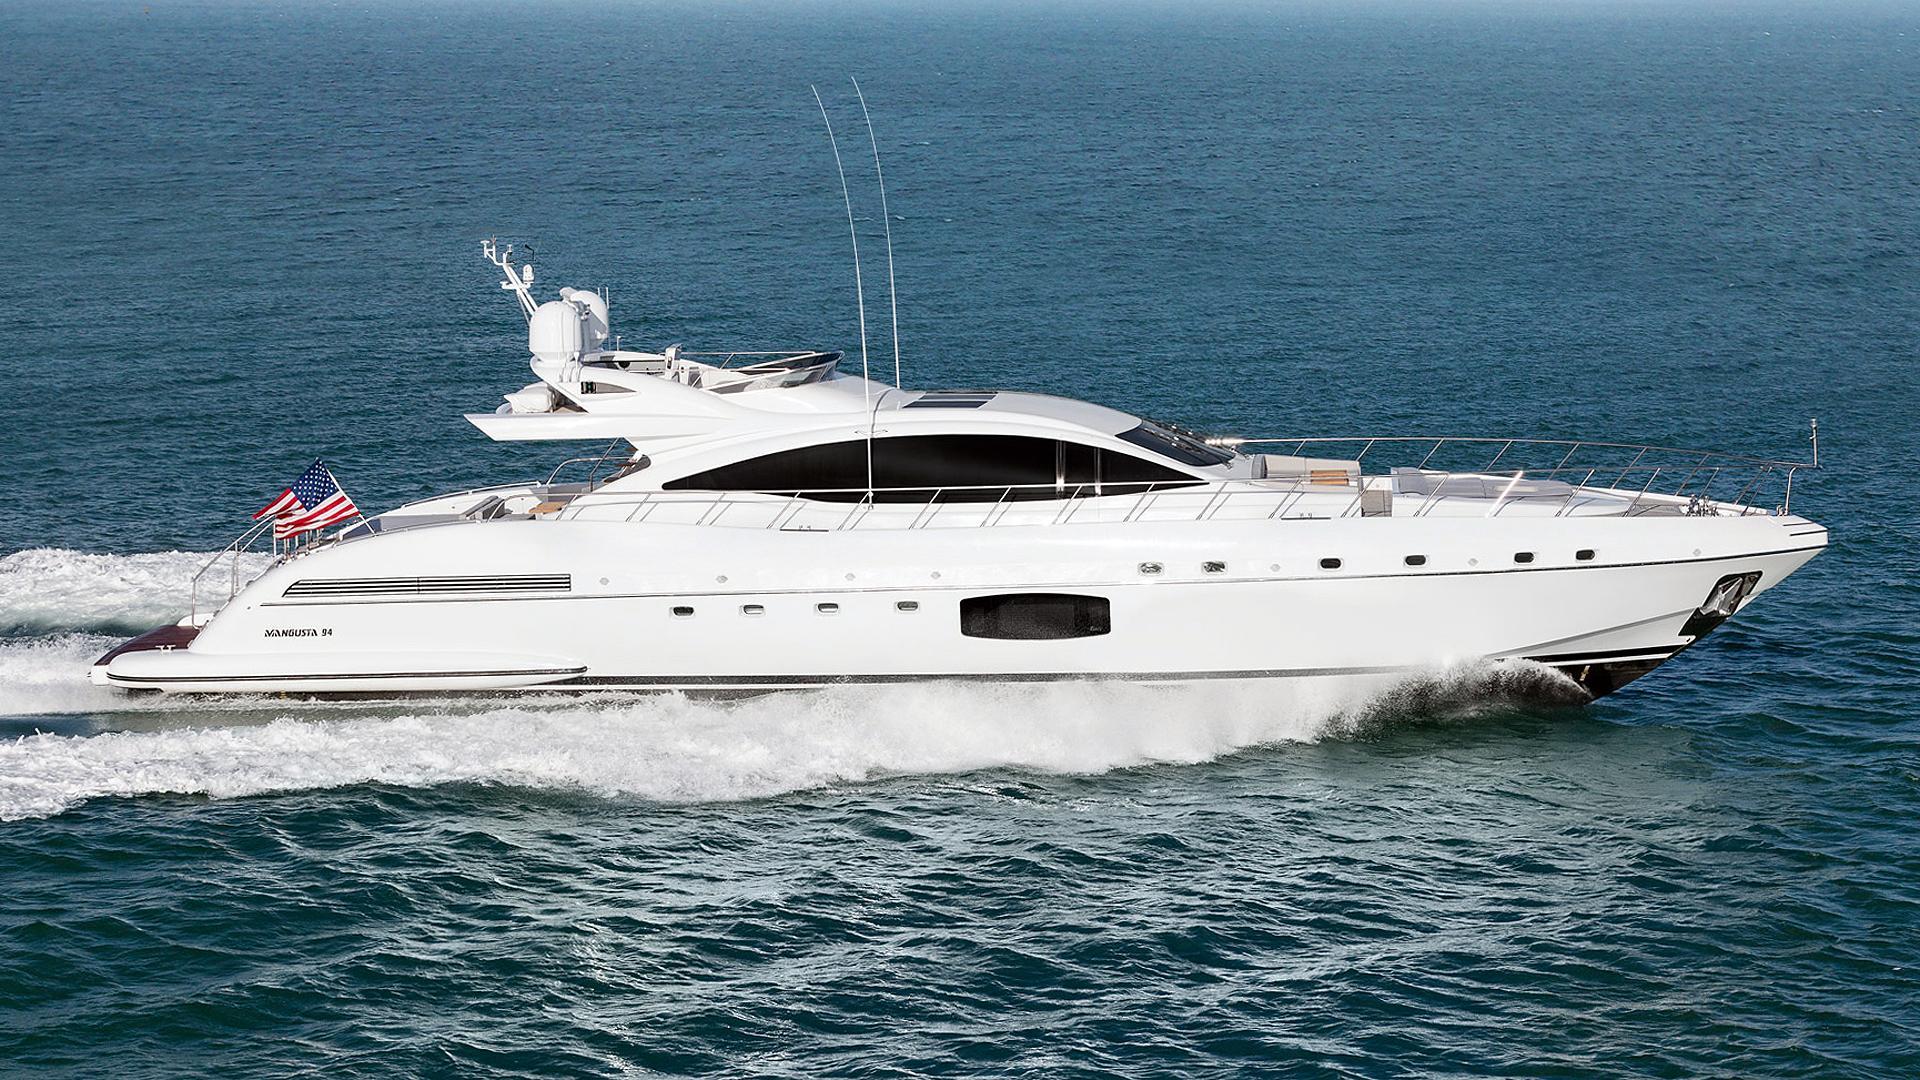 miss moneypenny stella bianca motoryacht overmarine mangusta 94 2016 29m cruising